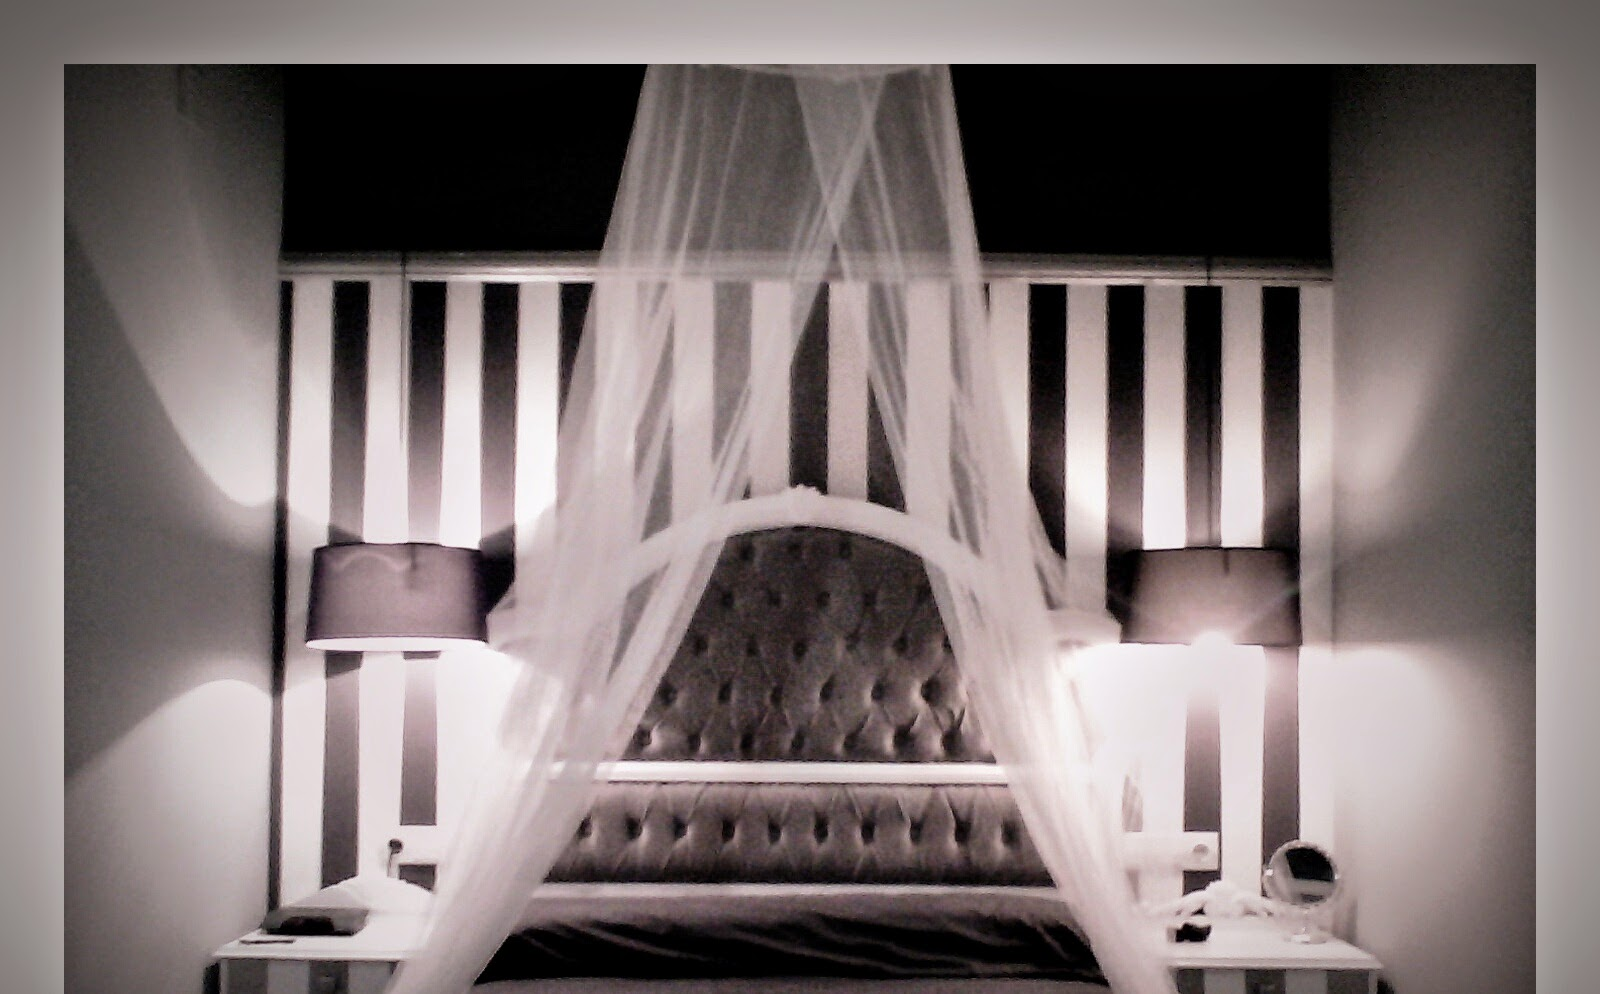 Revelo ideas low cost como renovar cabecero de cama con - Telas para forrar cabecero cama ...